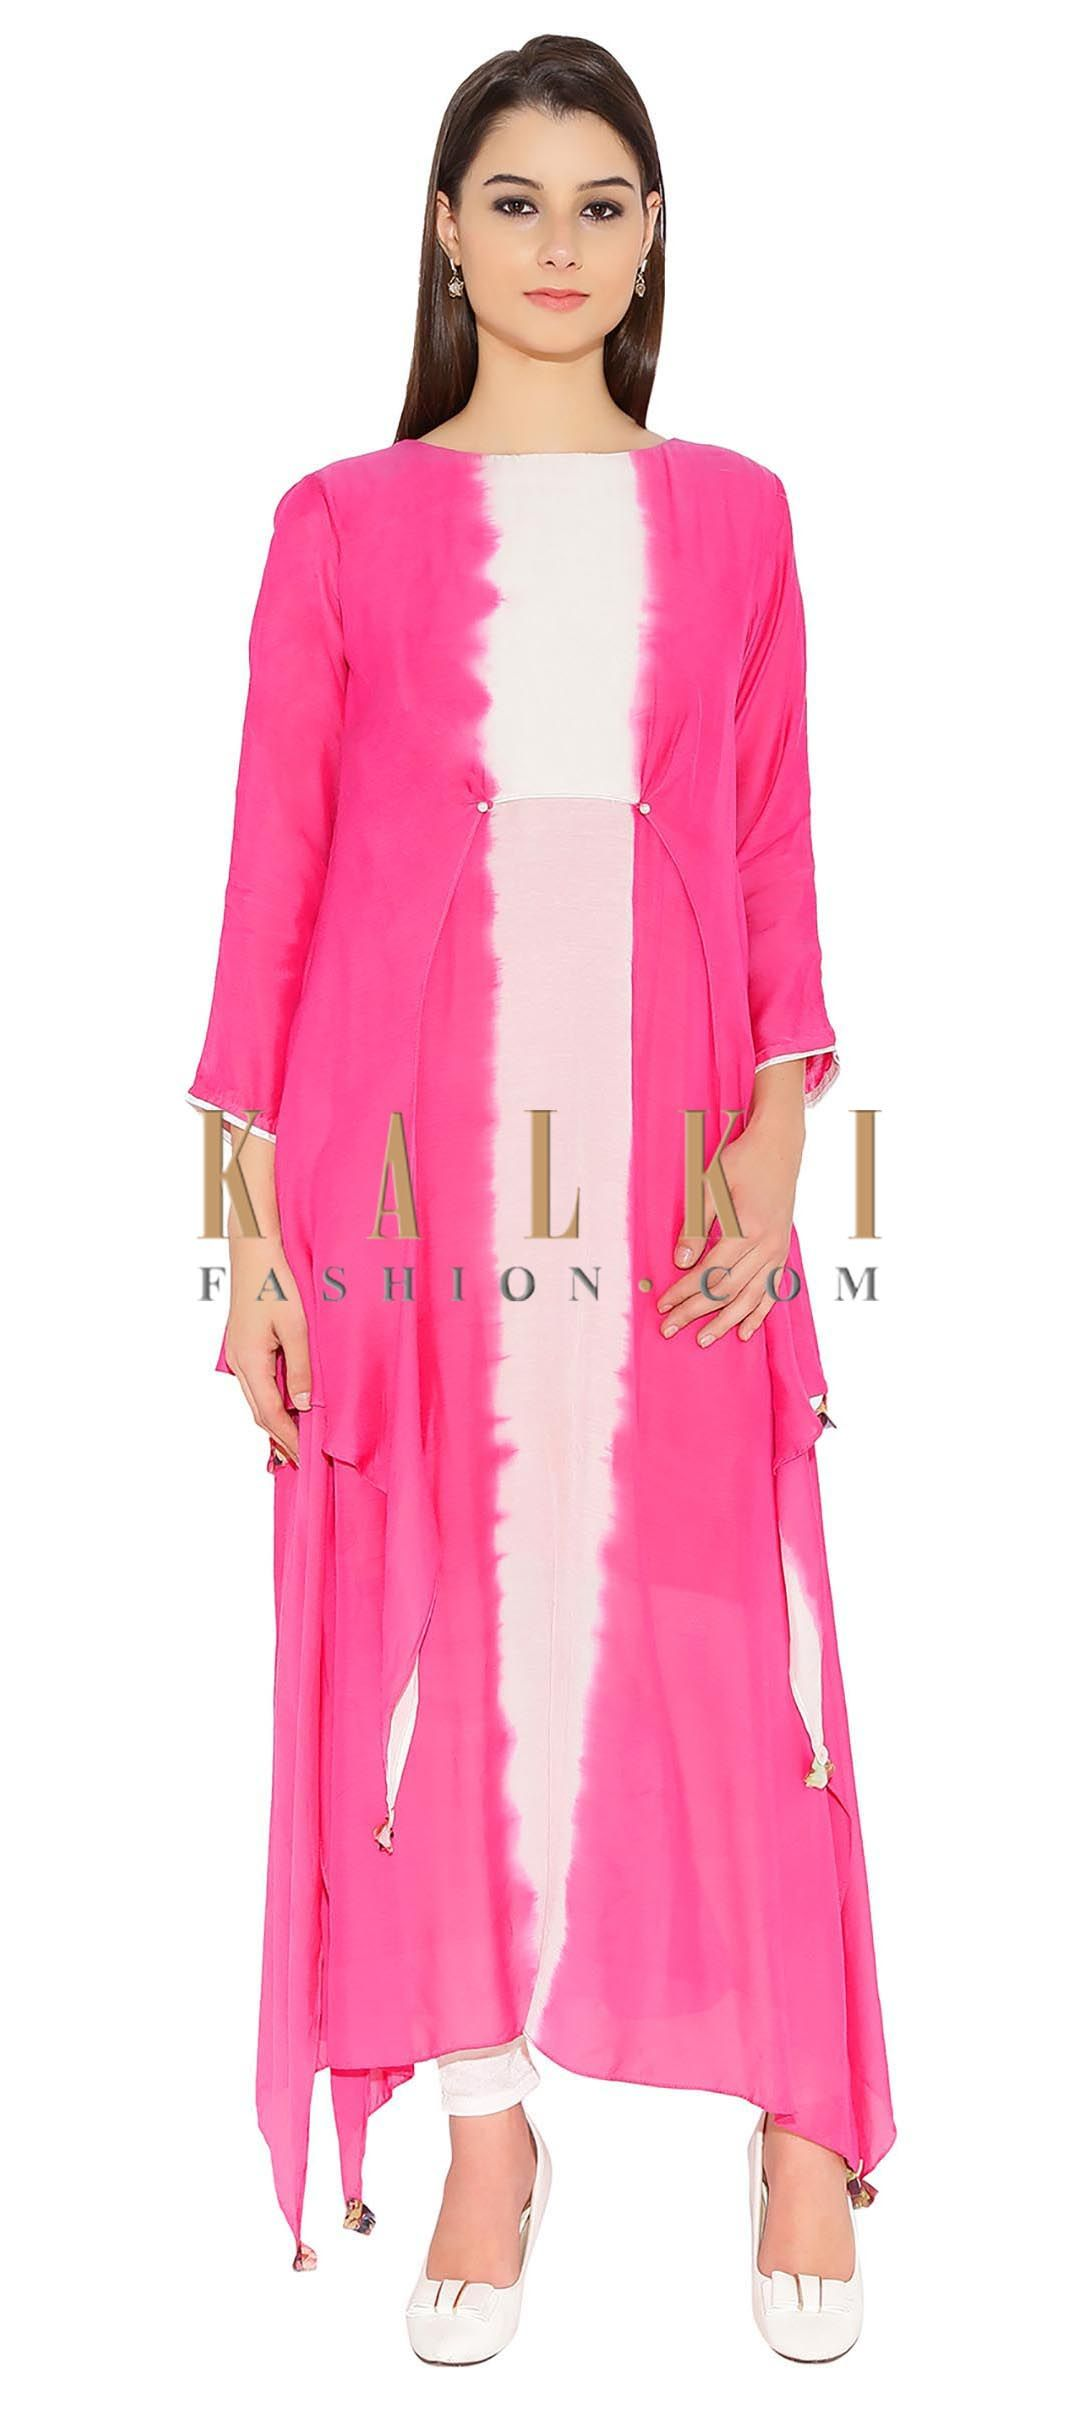 dd8efa59ea1 Fuchsia Pink Cotton Kurti With Two Tone And Diamond Tassels At End Only On  Kalki